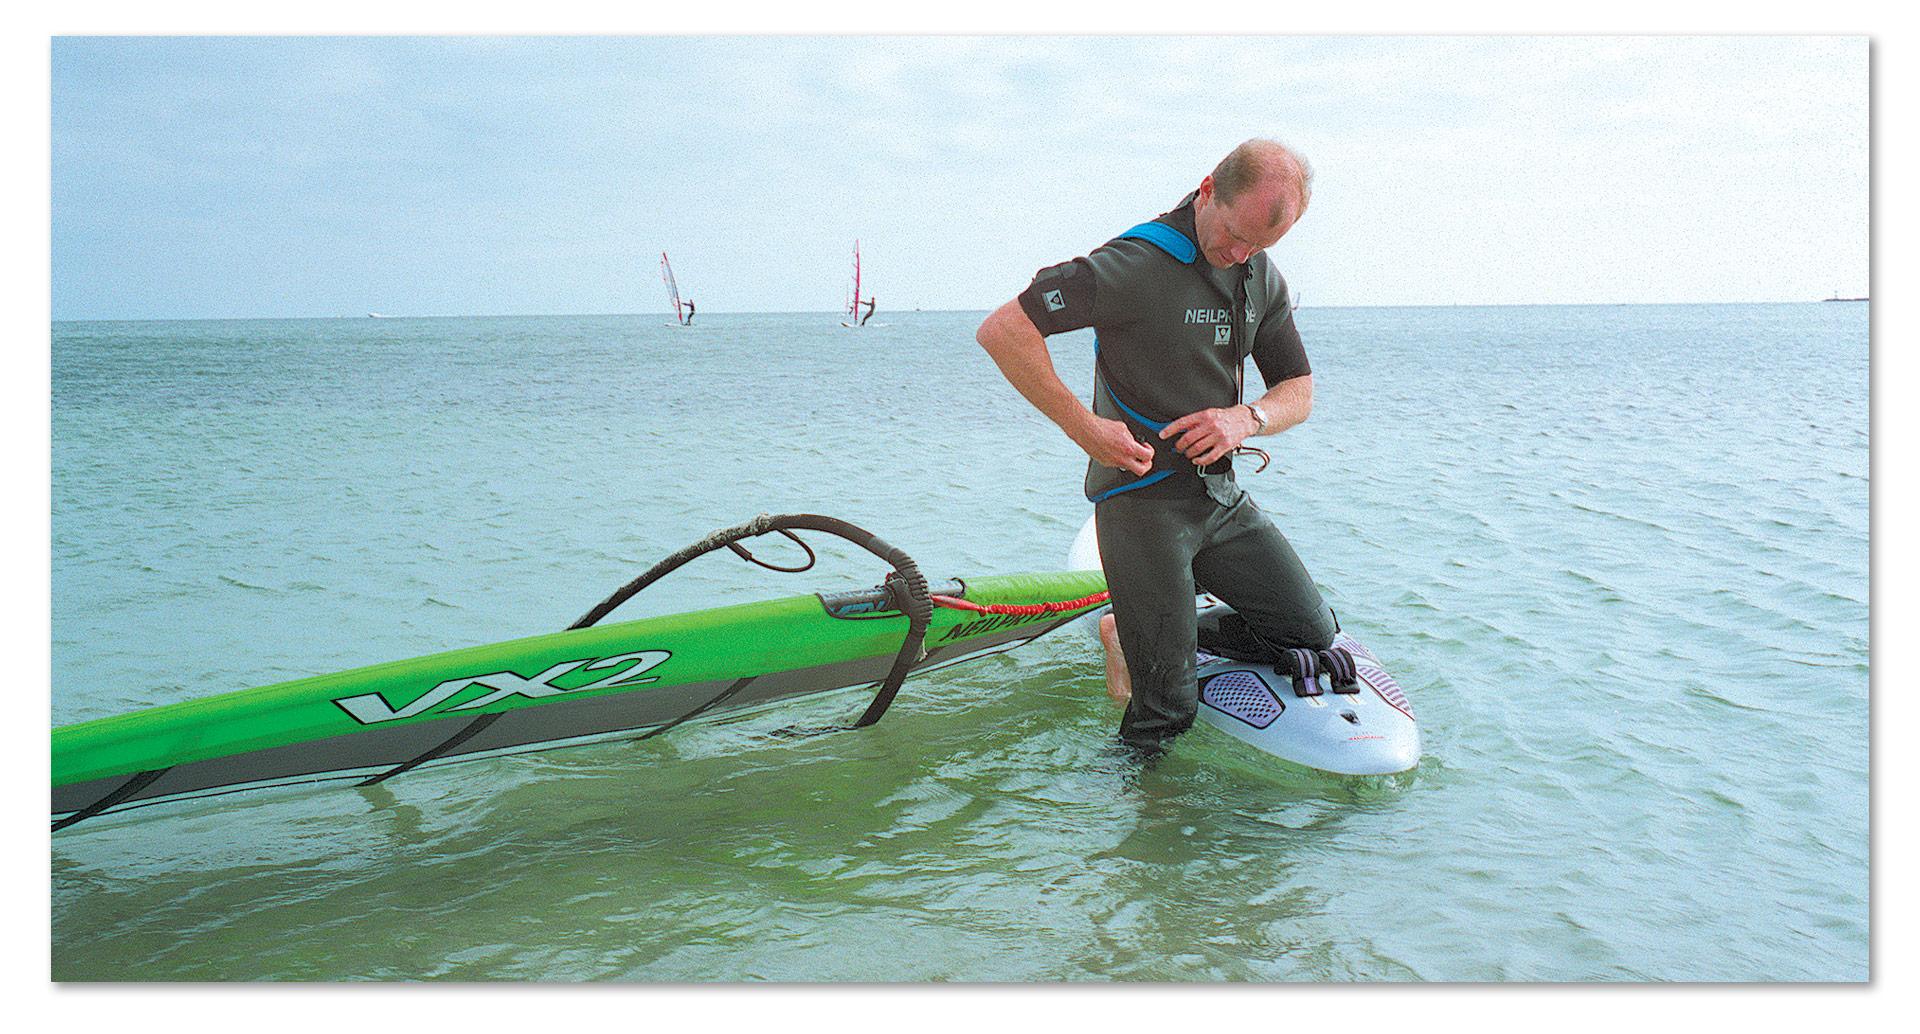 american_windsurfer_4.3_flame-keeper_PAUL-IN-HARNESS